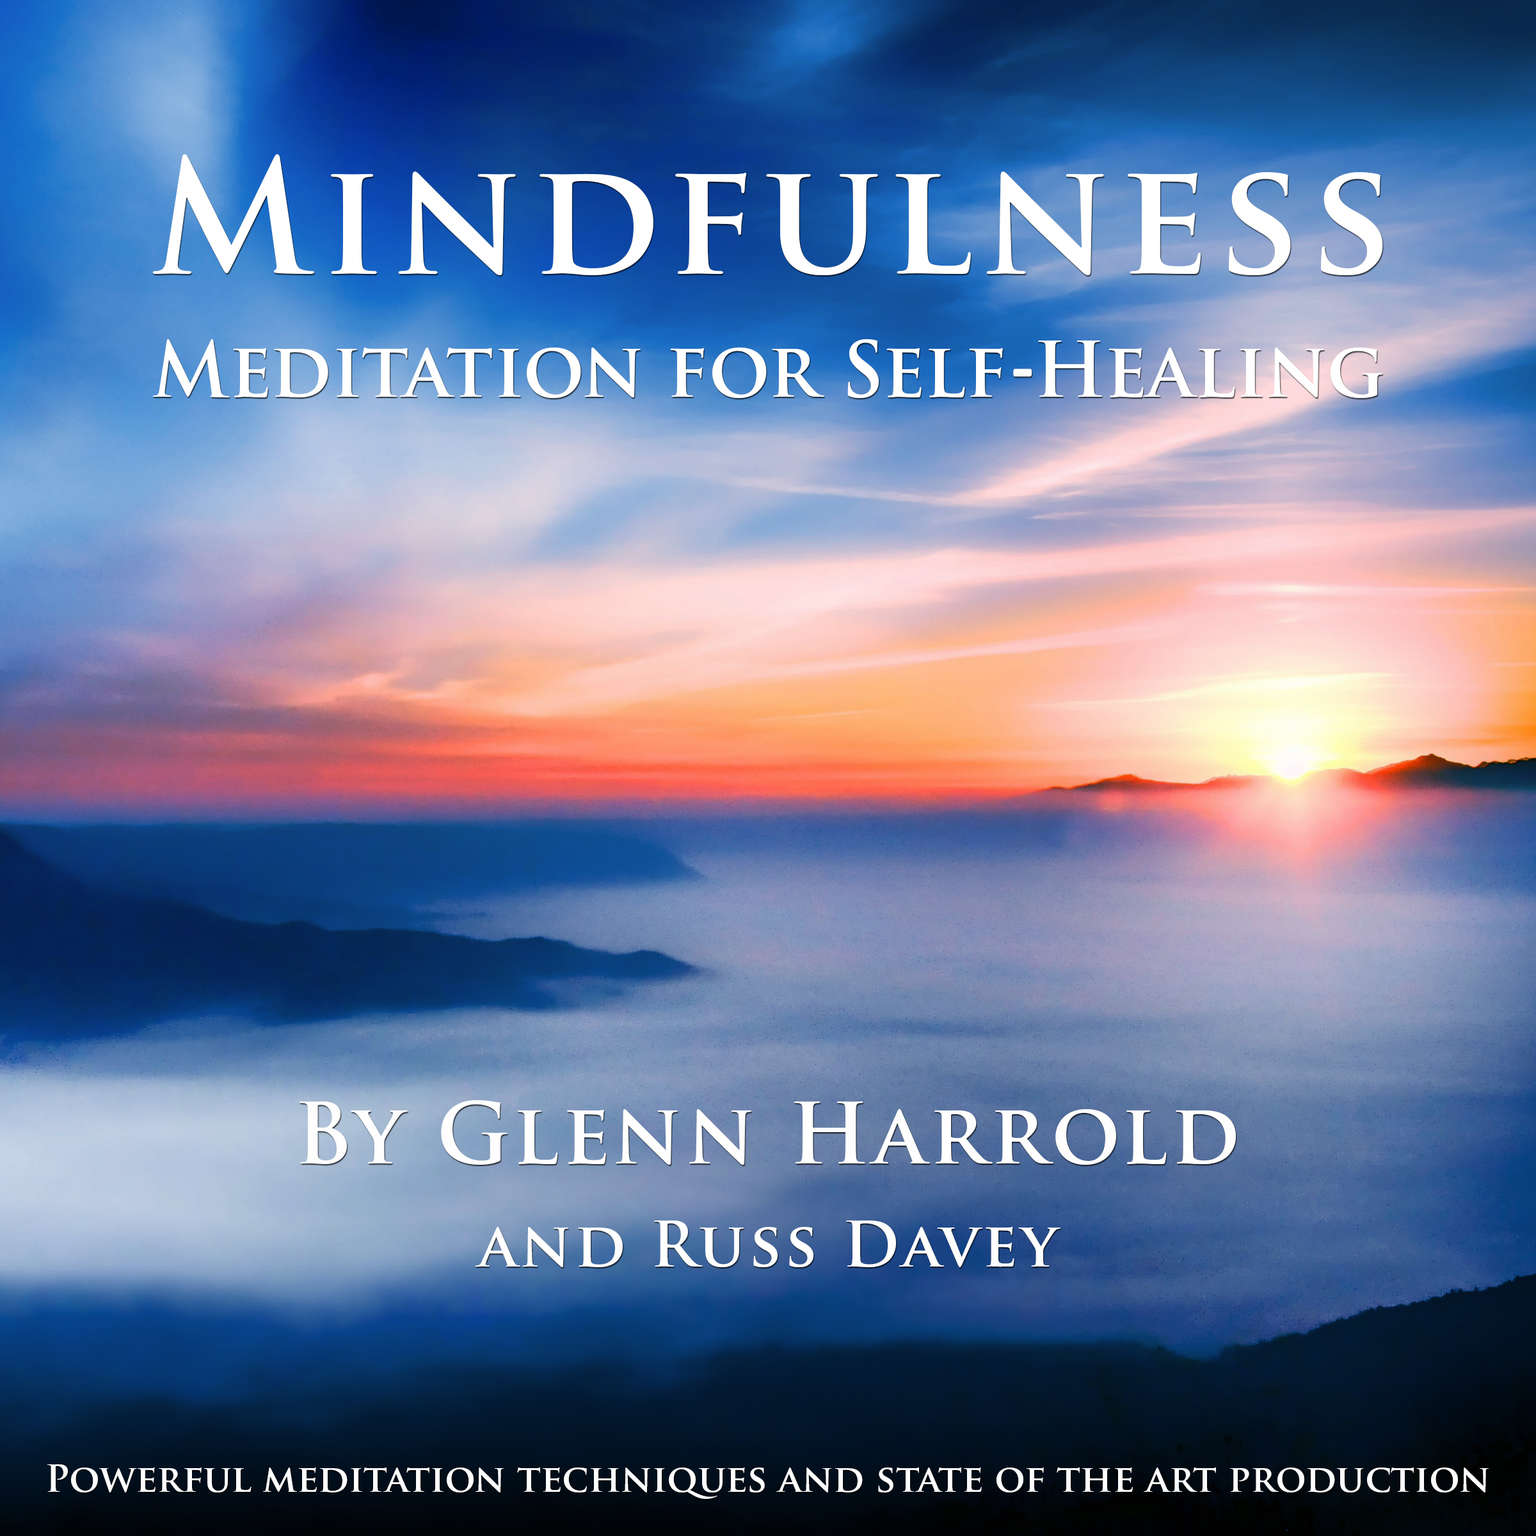 Mindfulness Meditation for Self-Healing Audiobook, by Glenn Harrold